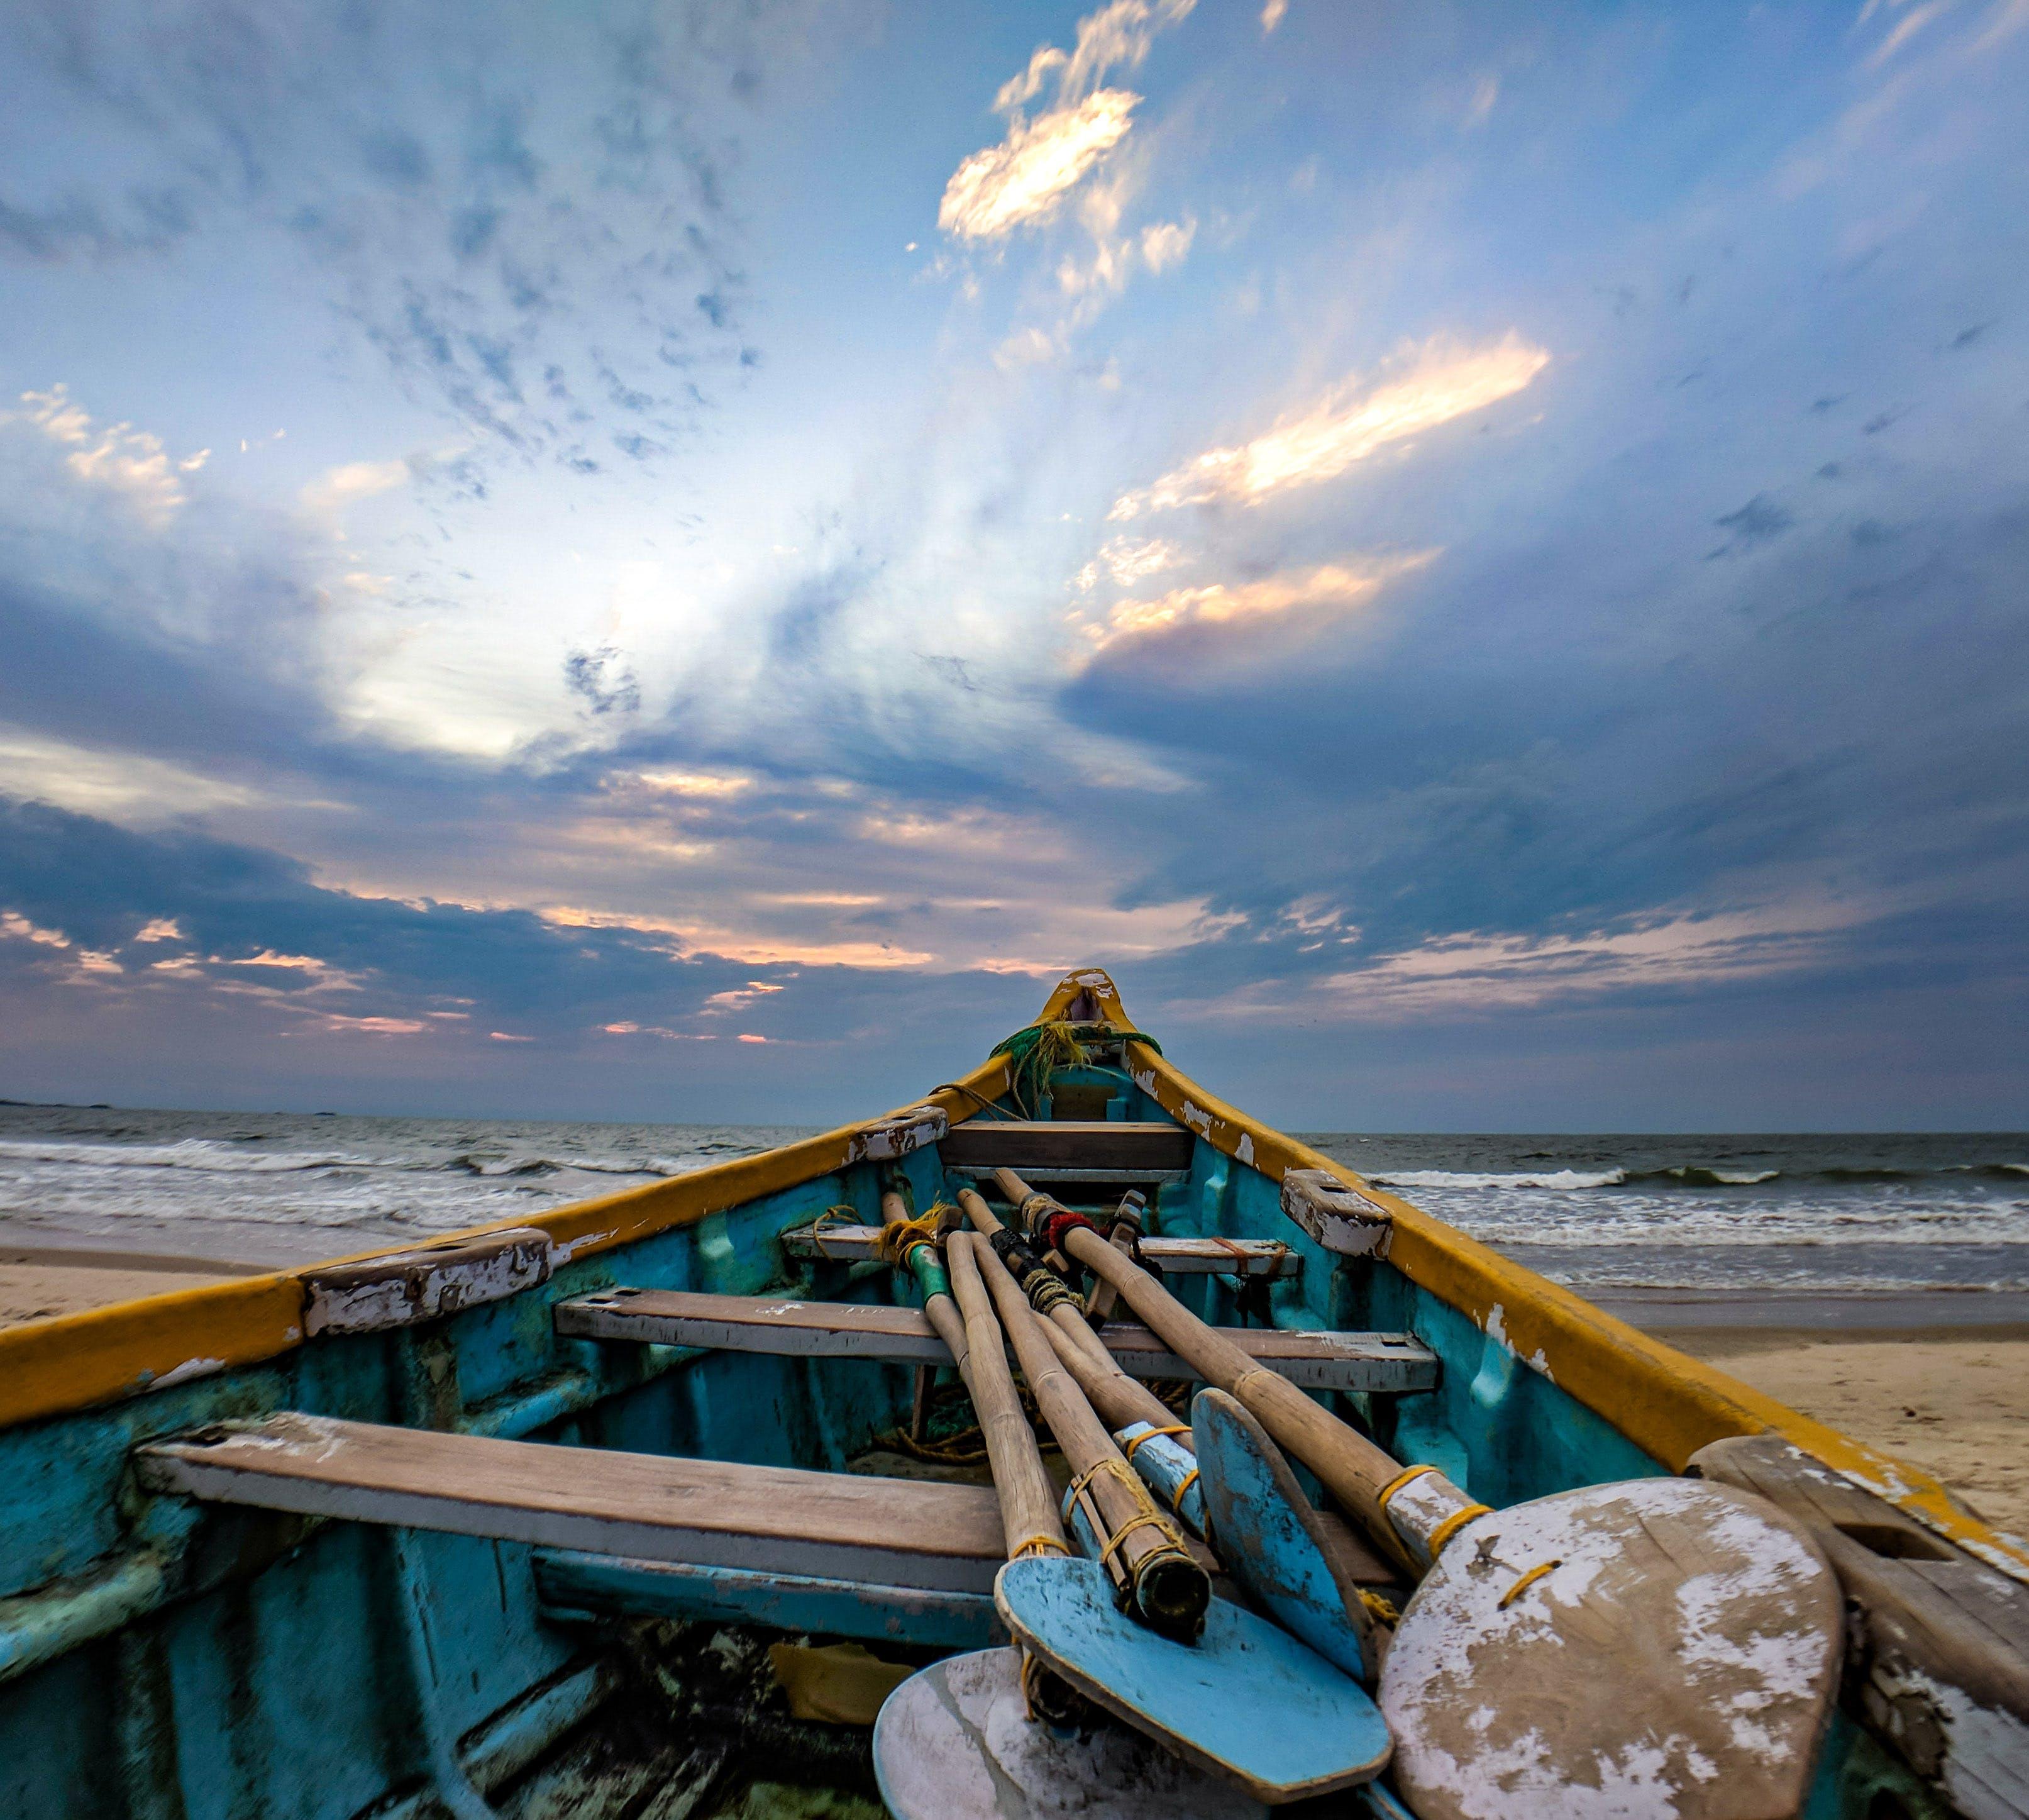 Fotos de stock gratuitas de agua, arena, barca, dice adiós